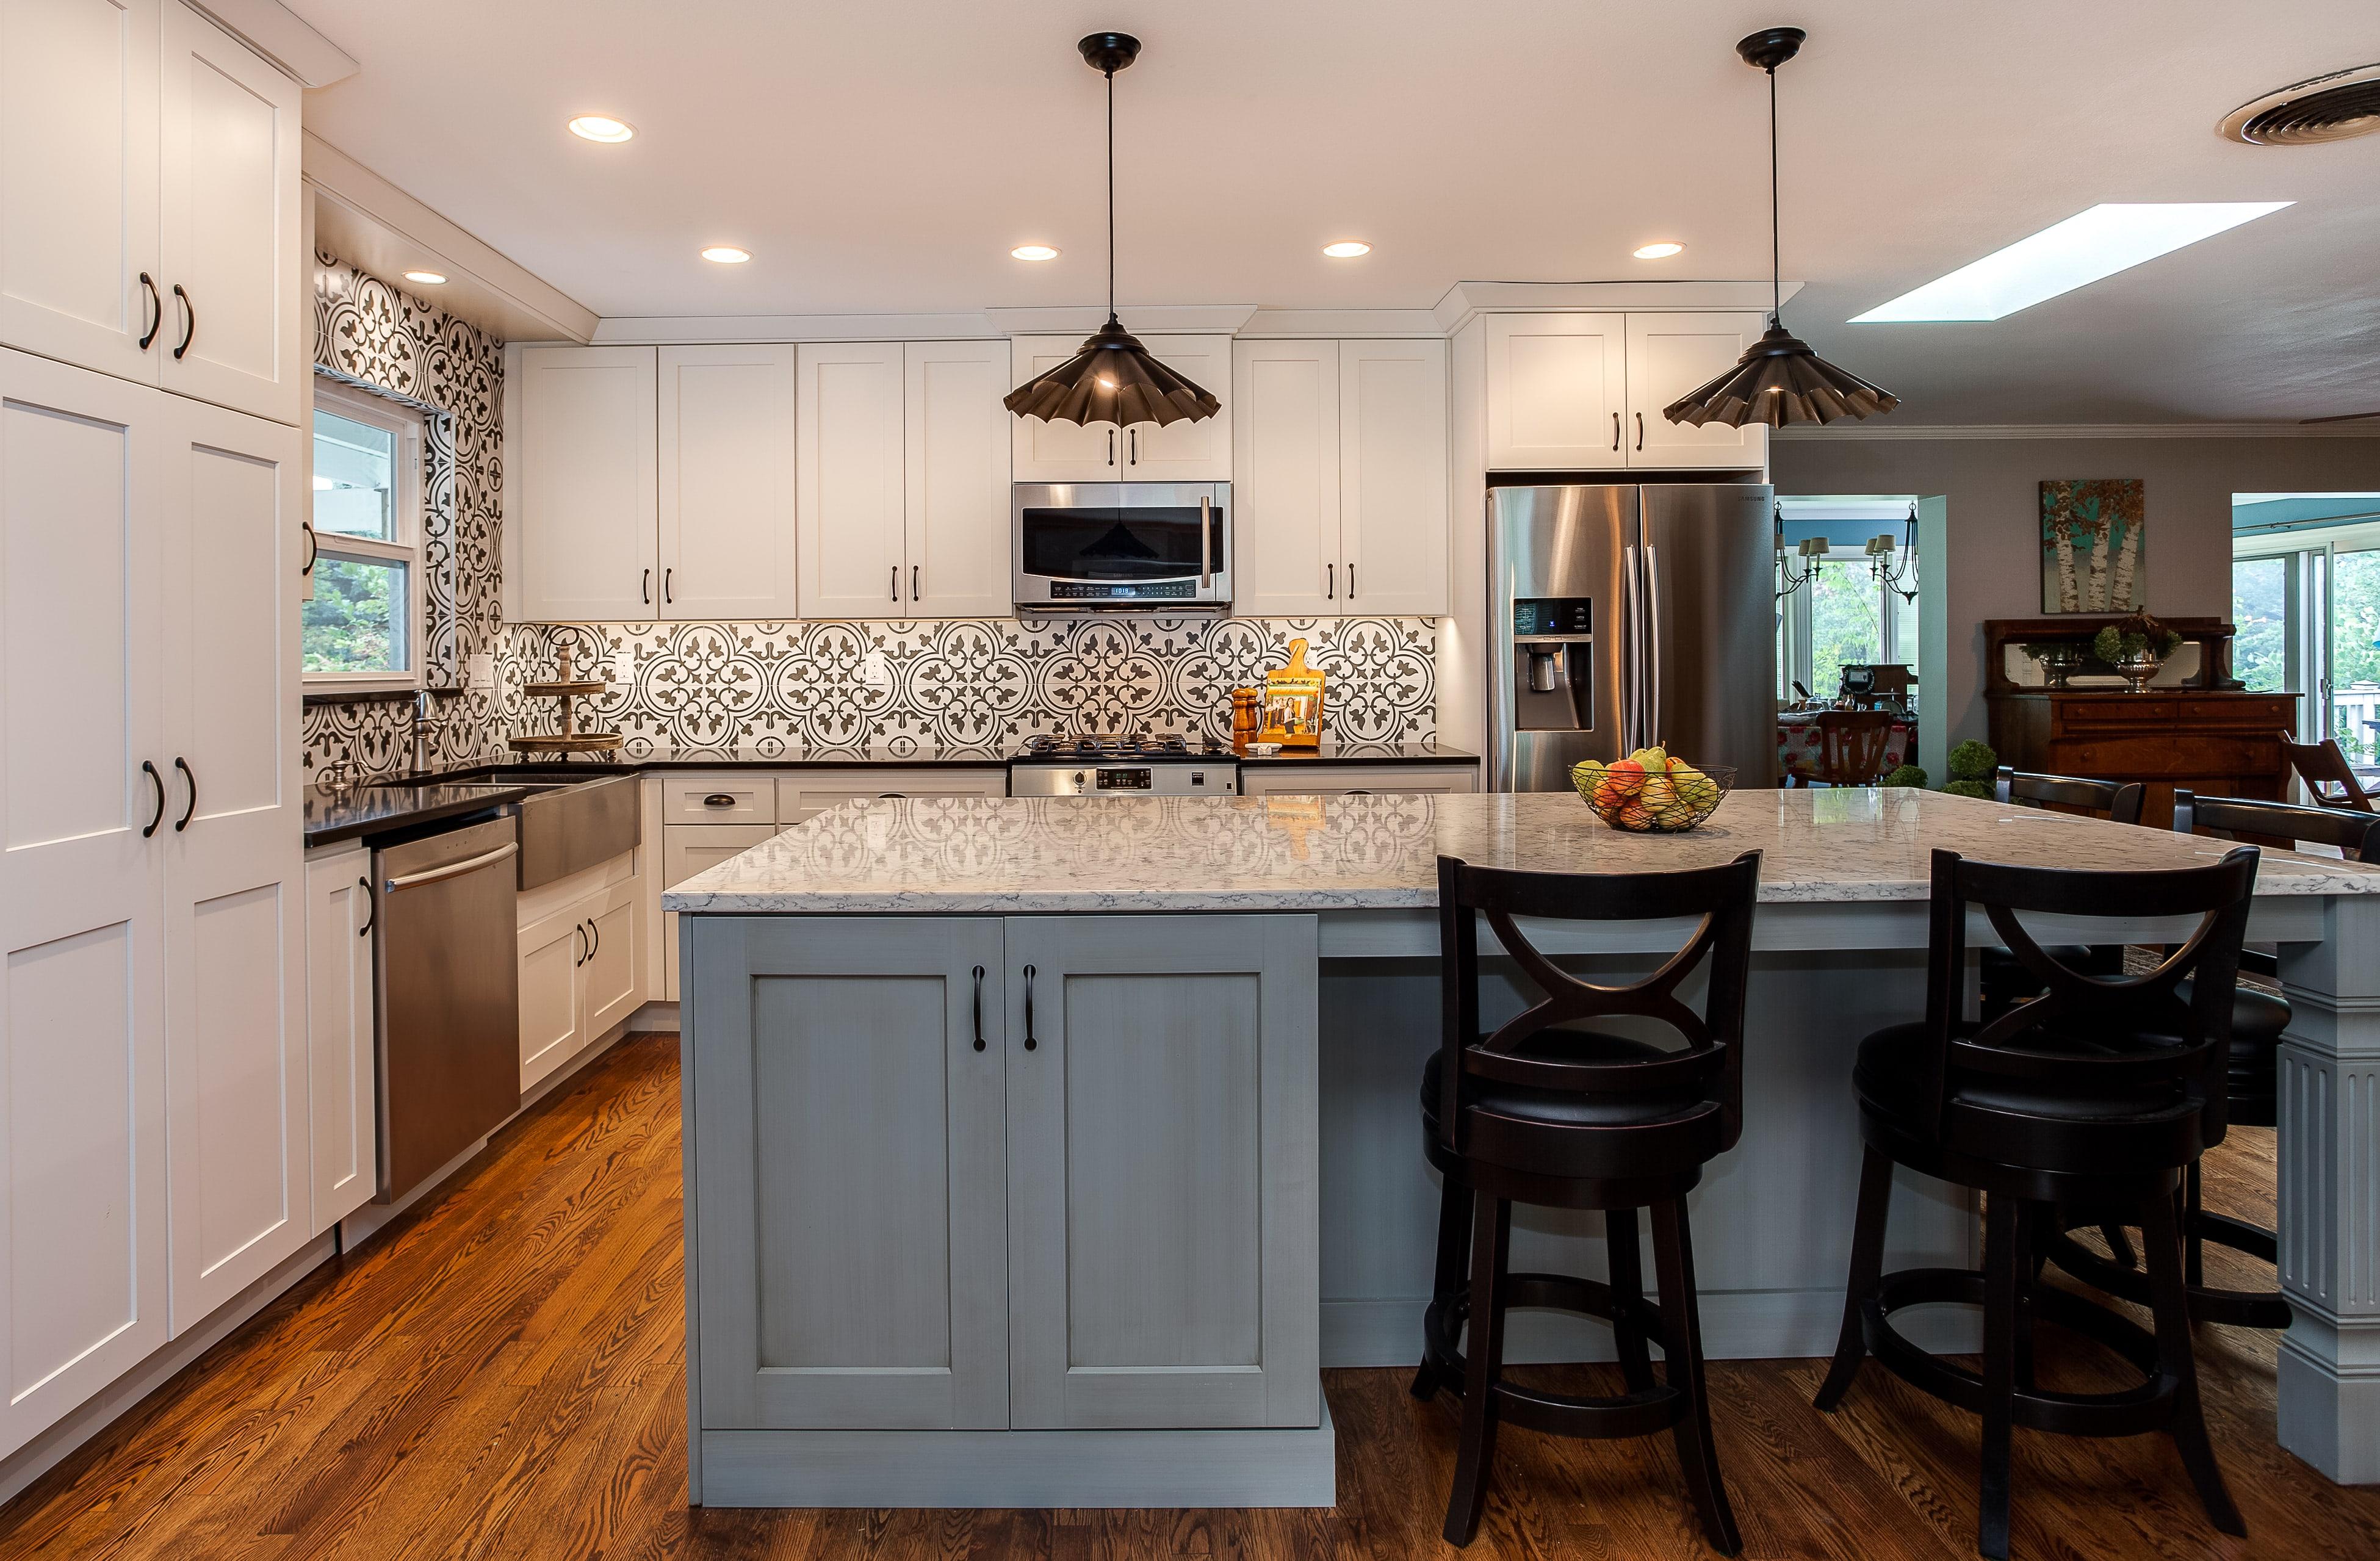 White cabinet kitchen with grey tile backsplash